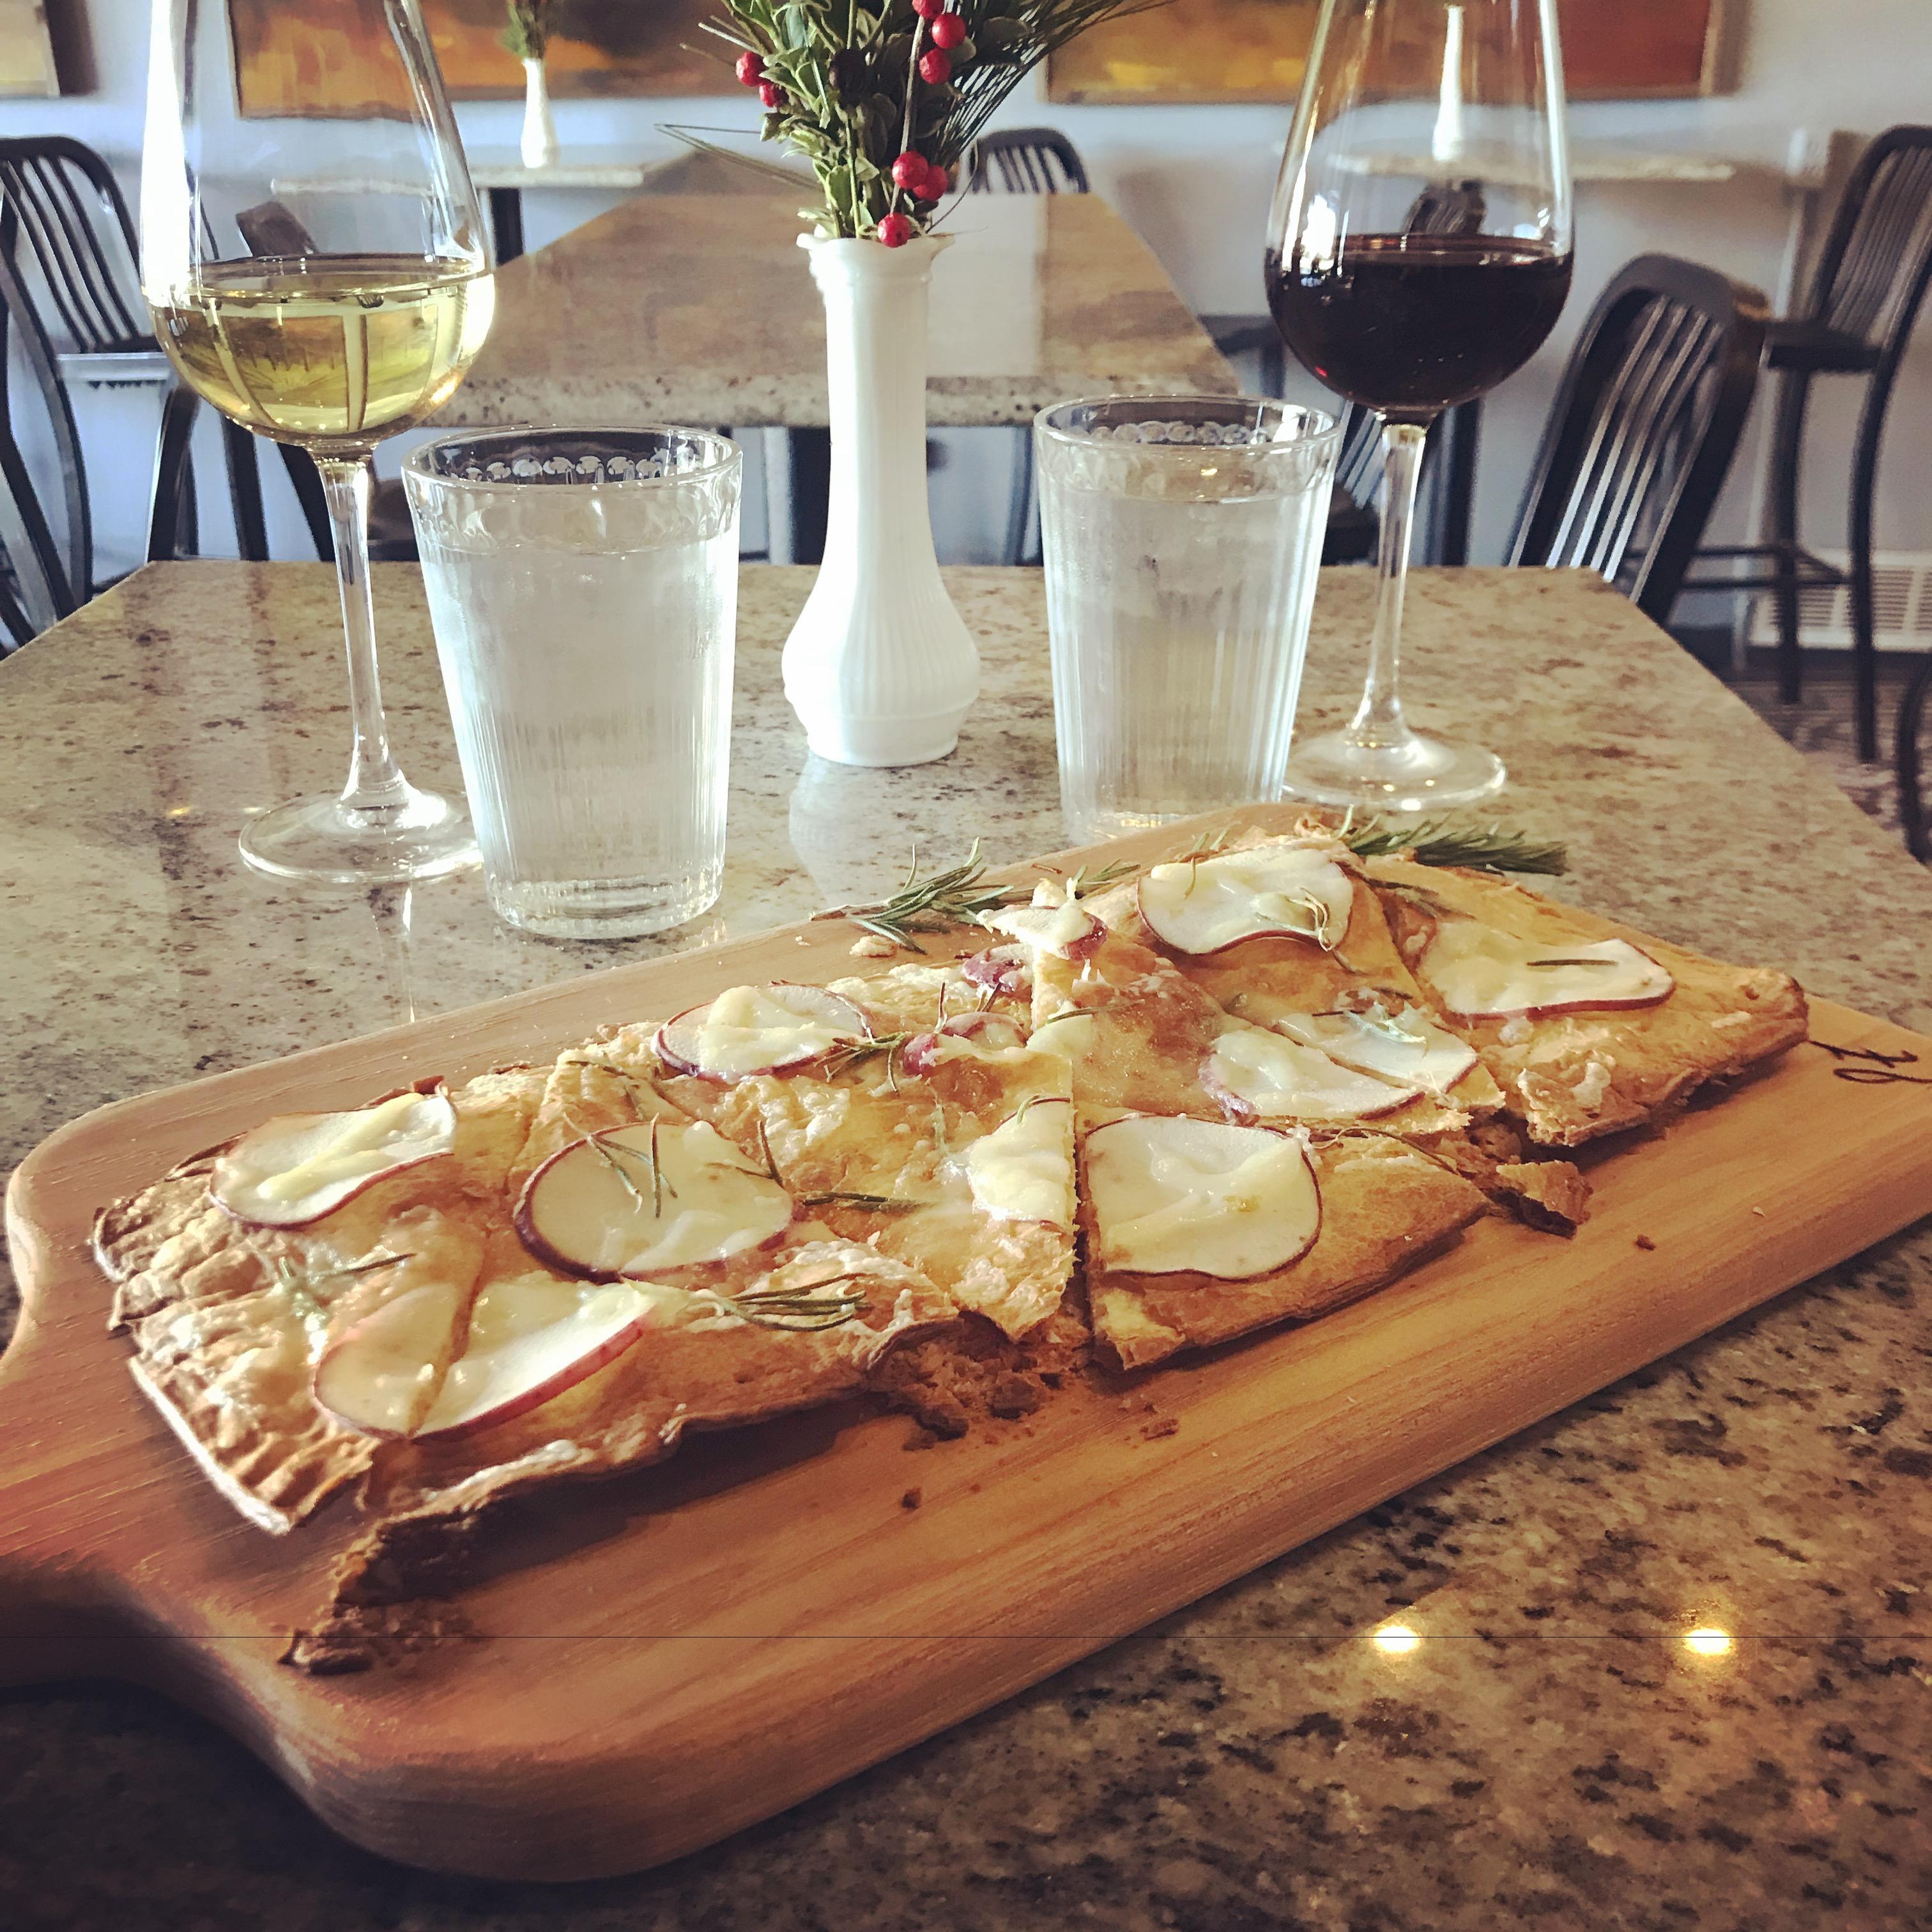 Potato, Rosemary and swiss cheese flatbread